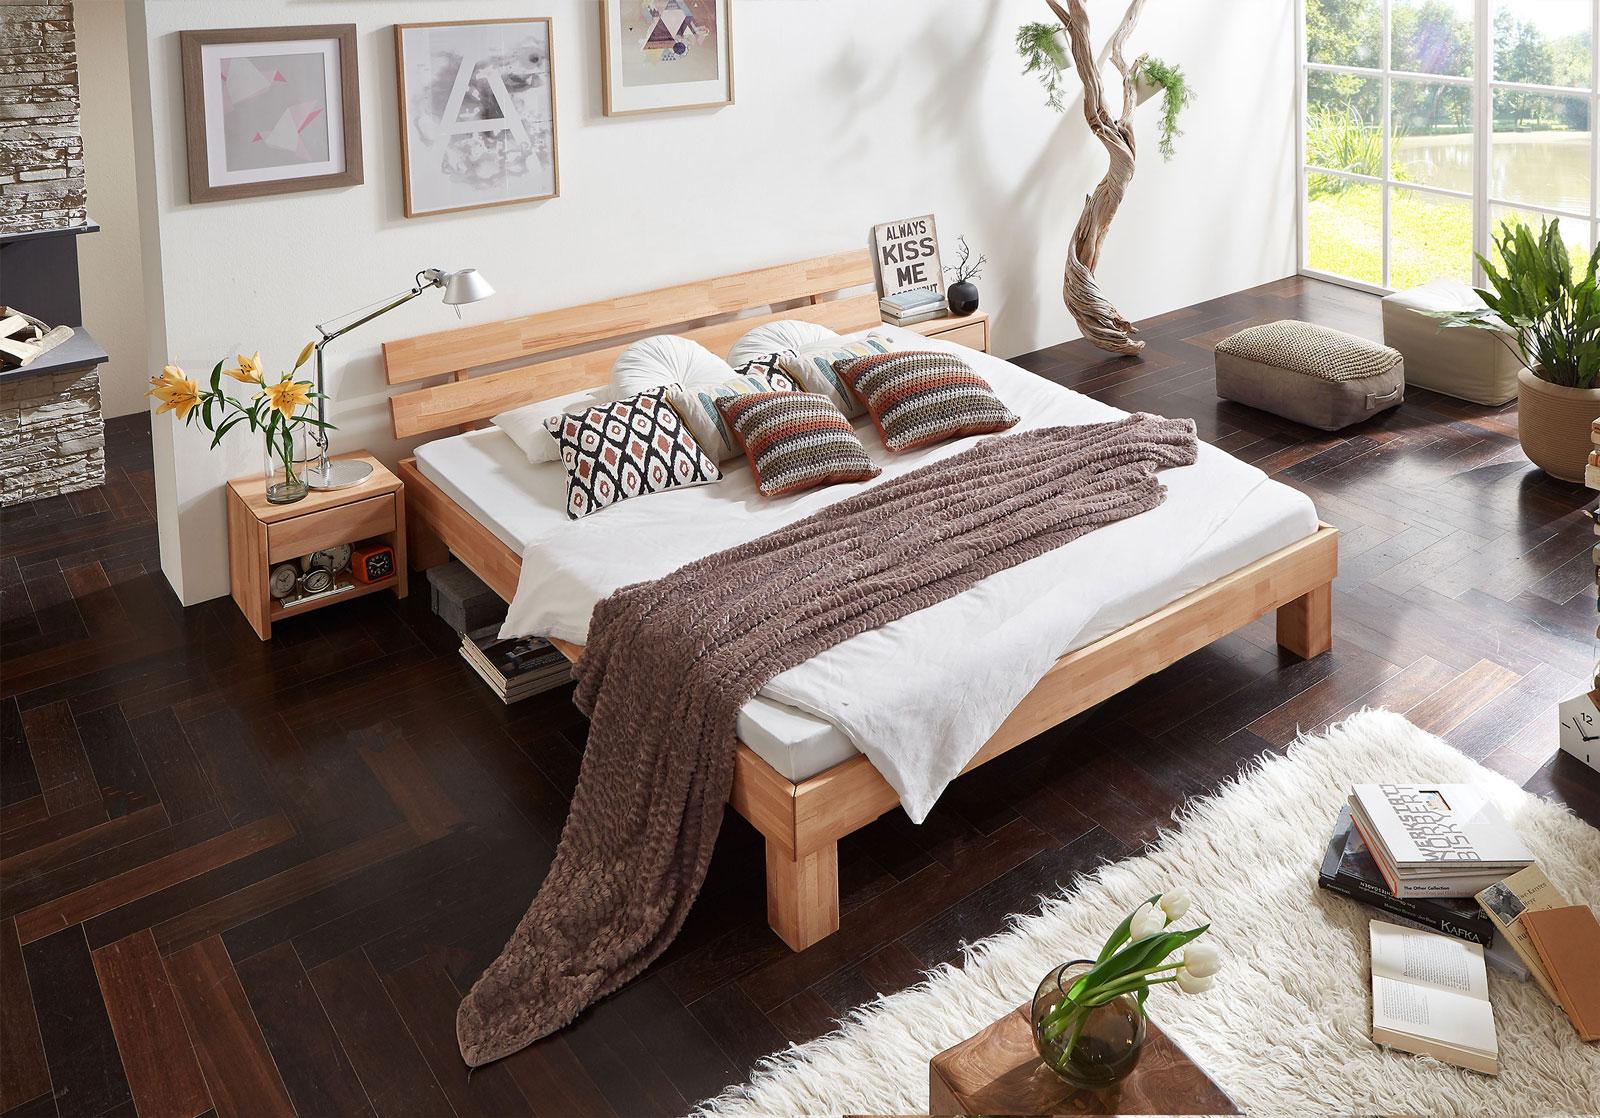 SAM® Massivholzbett Doppelbett in Kernbuche geölt 160 x 200 cm JULIA ...